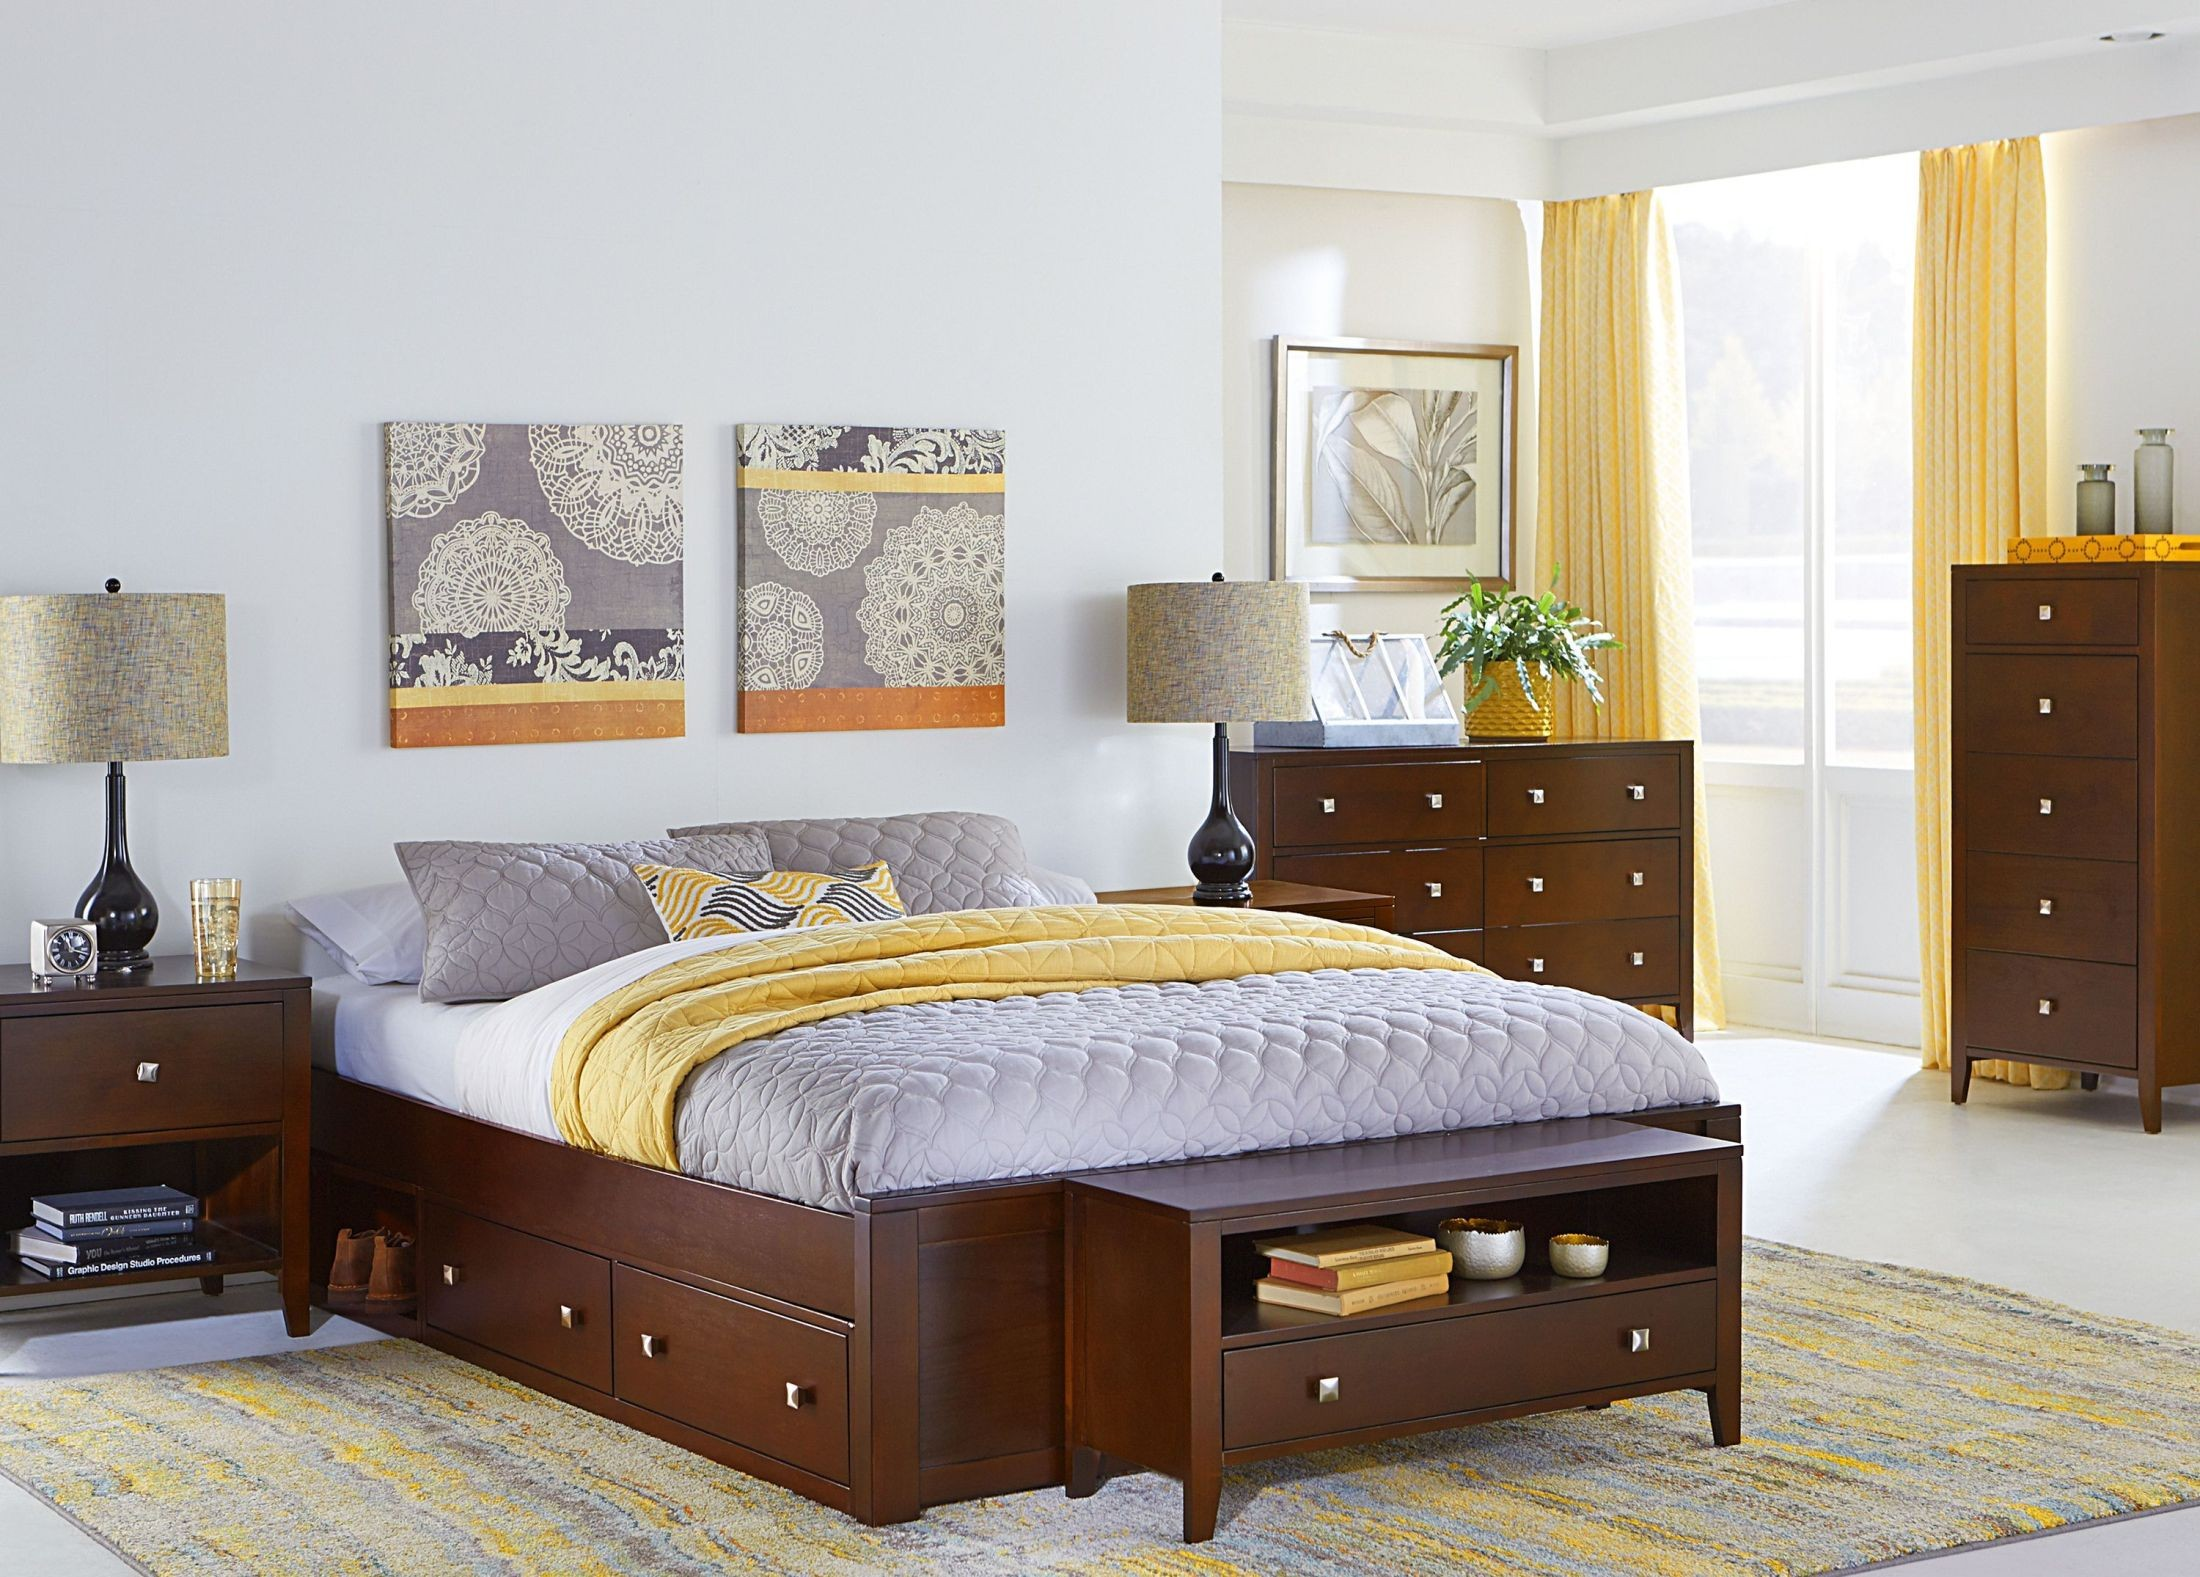 Pulse cherry platform bedroom set with storage from ne - Platform bedroom sets with storage ...